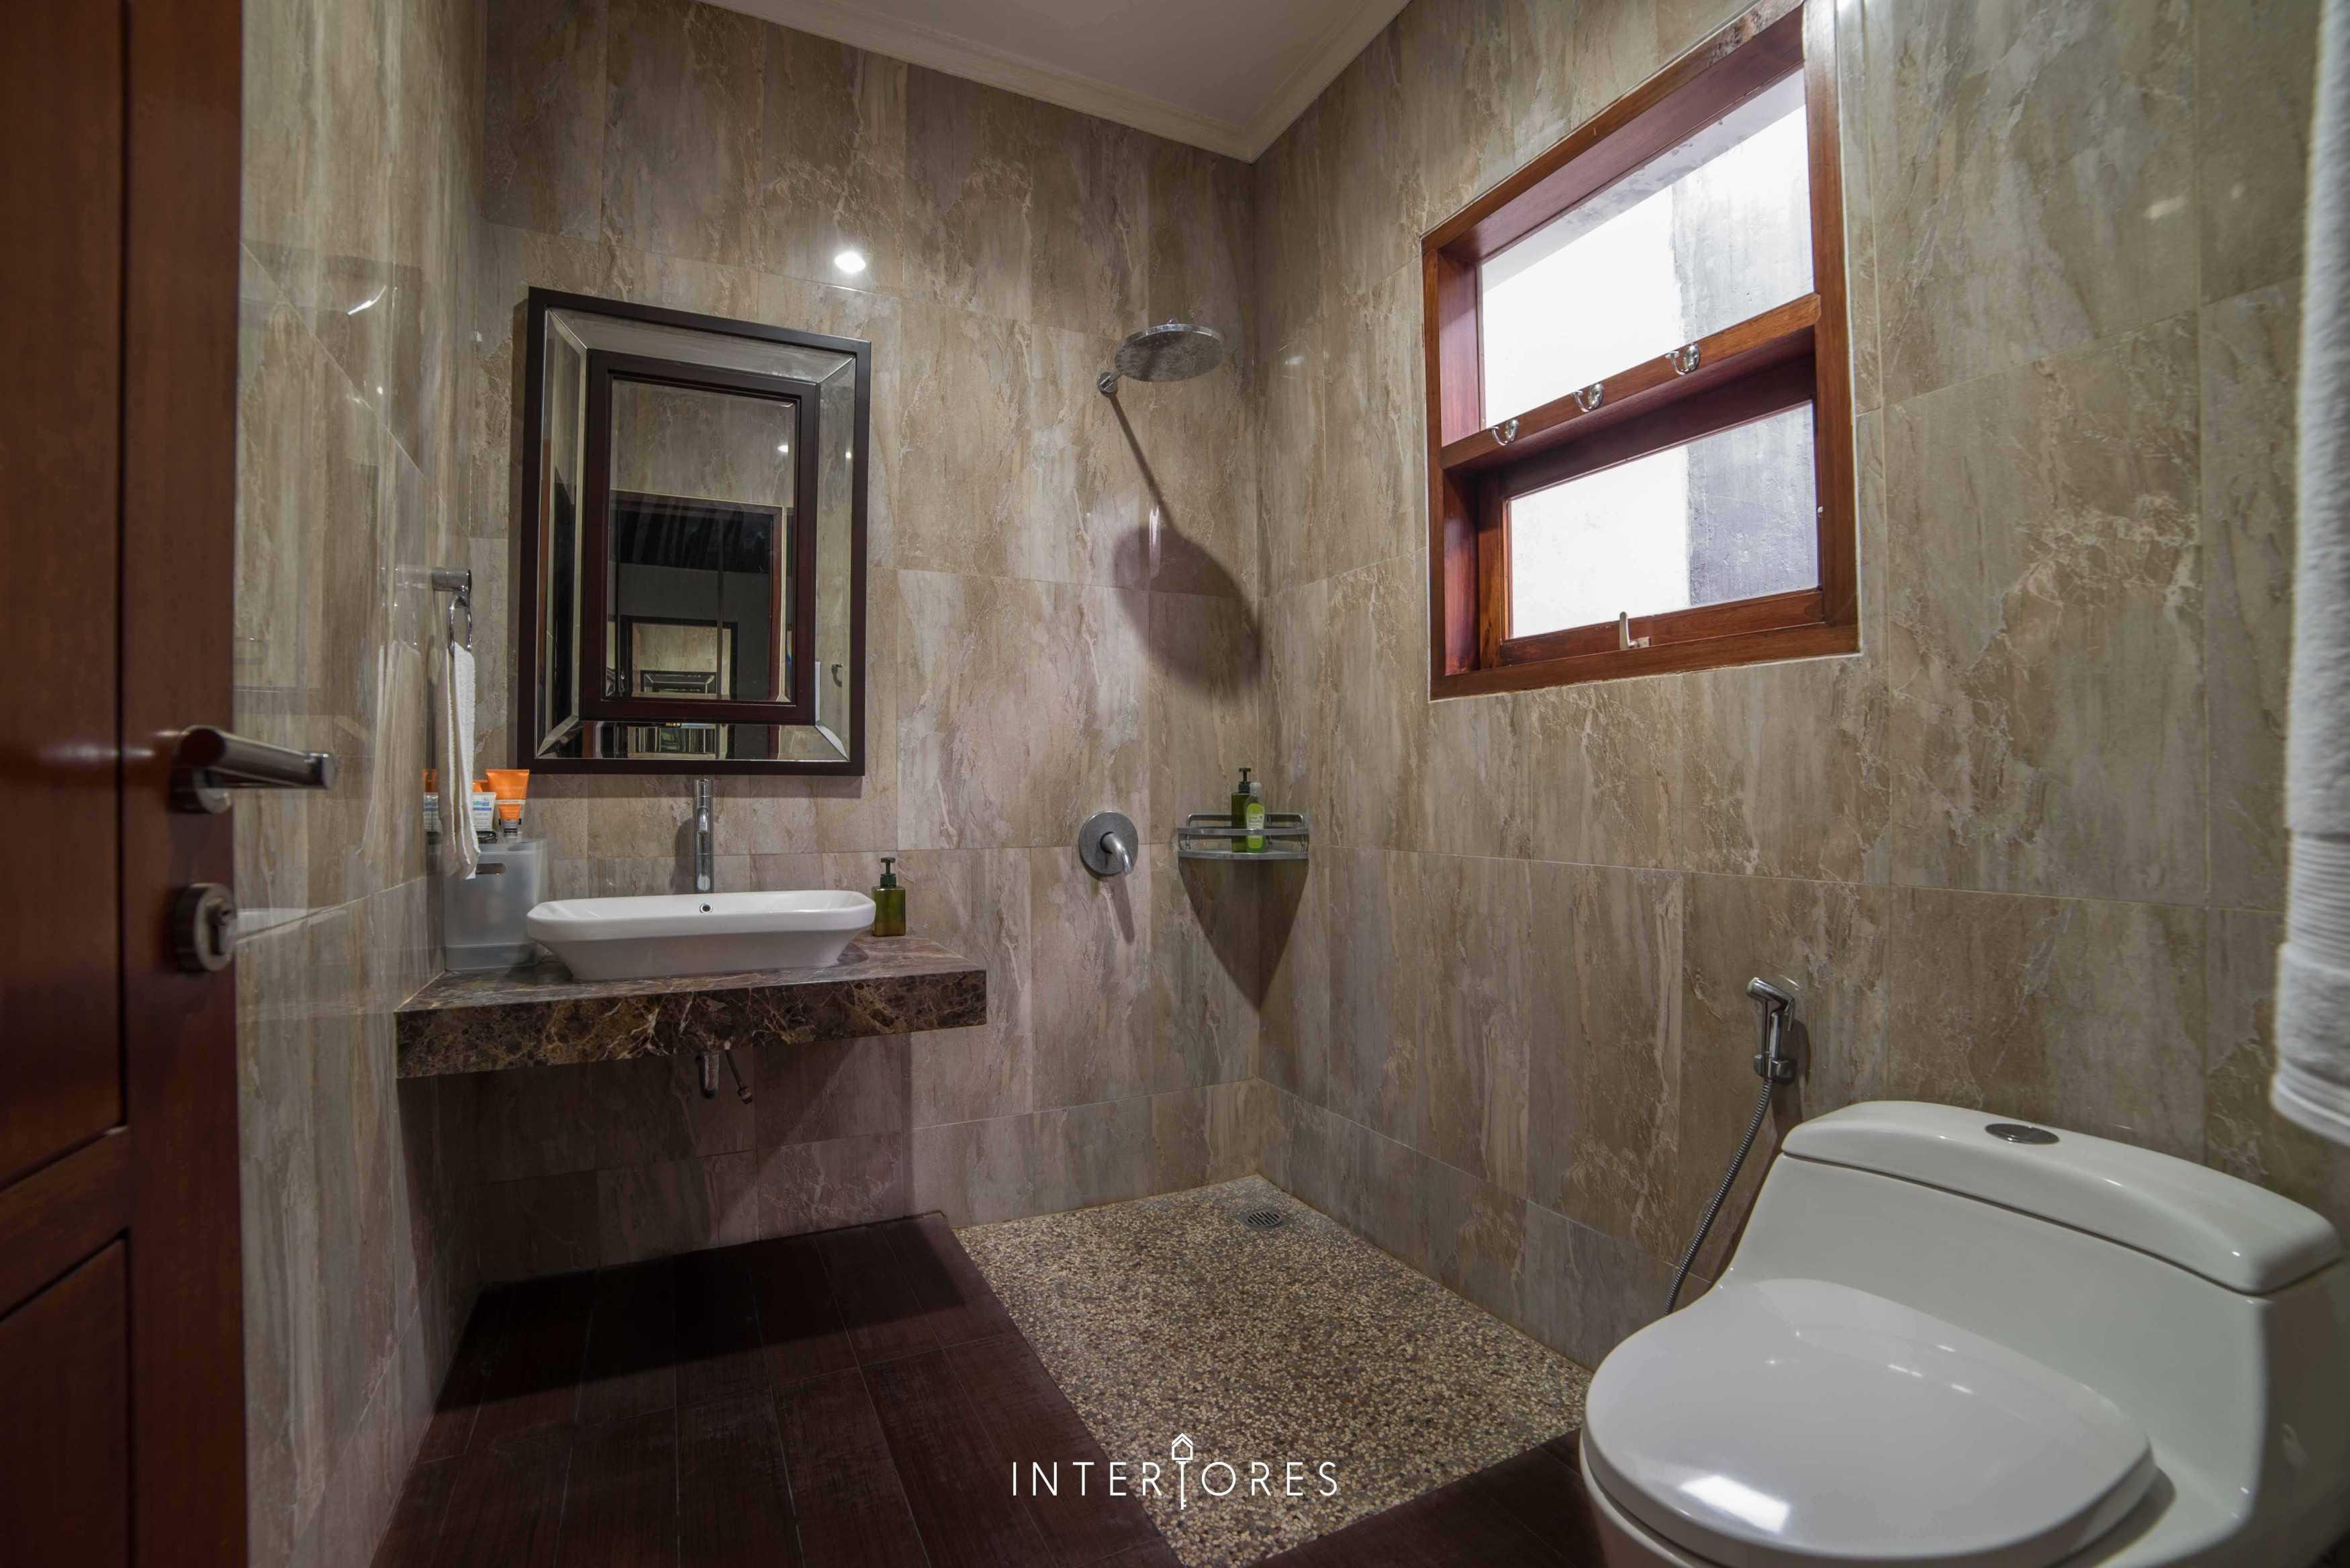 Interiores Interior Consultant & Build Greta 90 Bintaro Bintaro Bathroom Kontemporer  17681